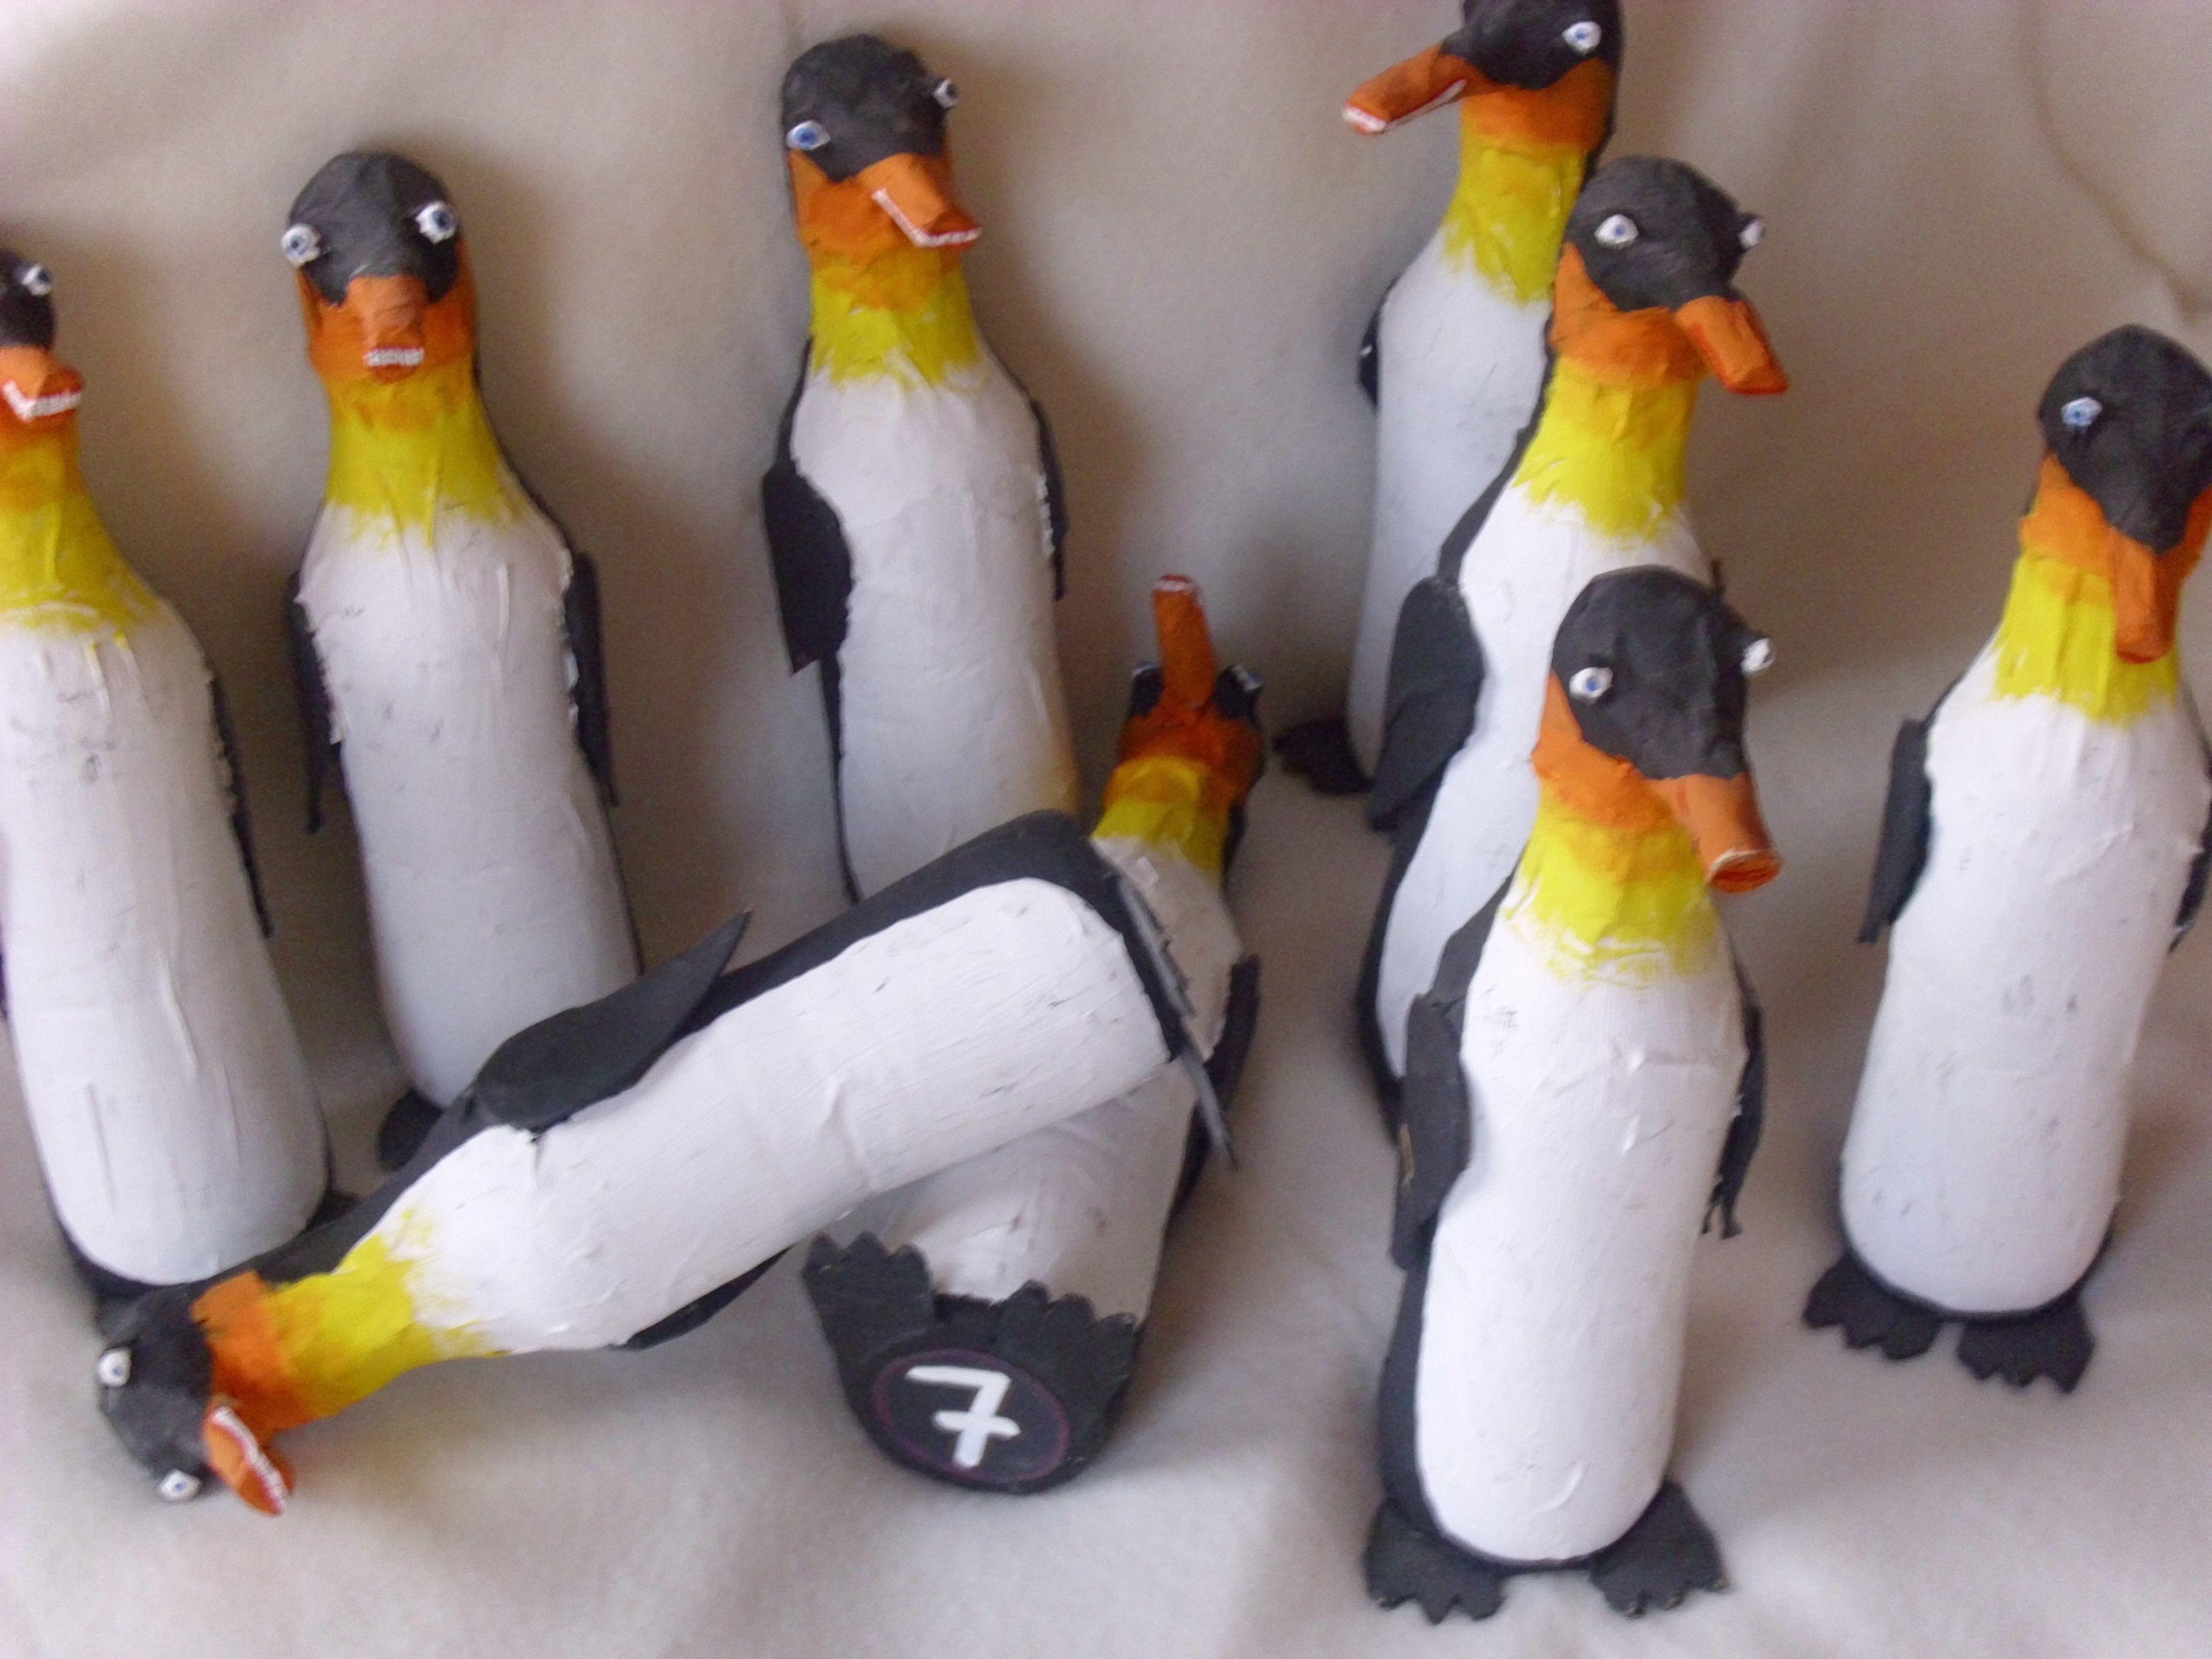 Pinguin-Kegel. Mann braucht jede Menge leere Pet-Flaschen ...